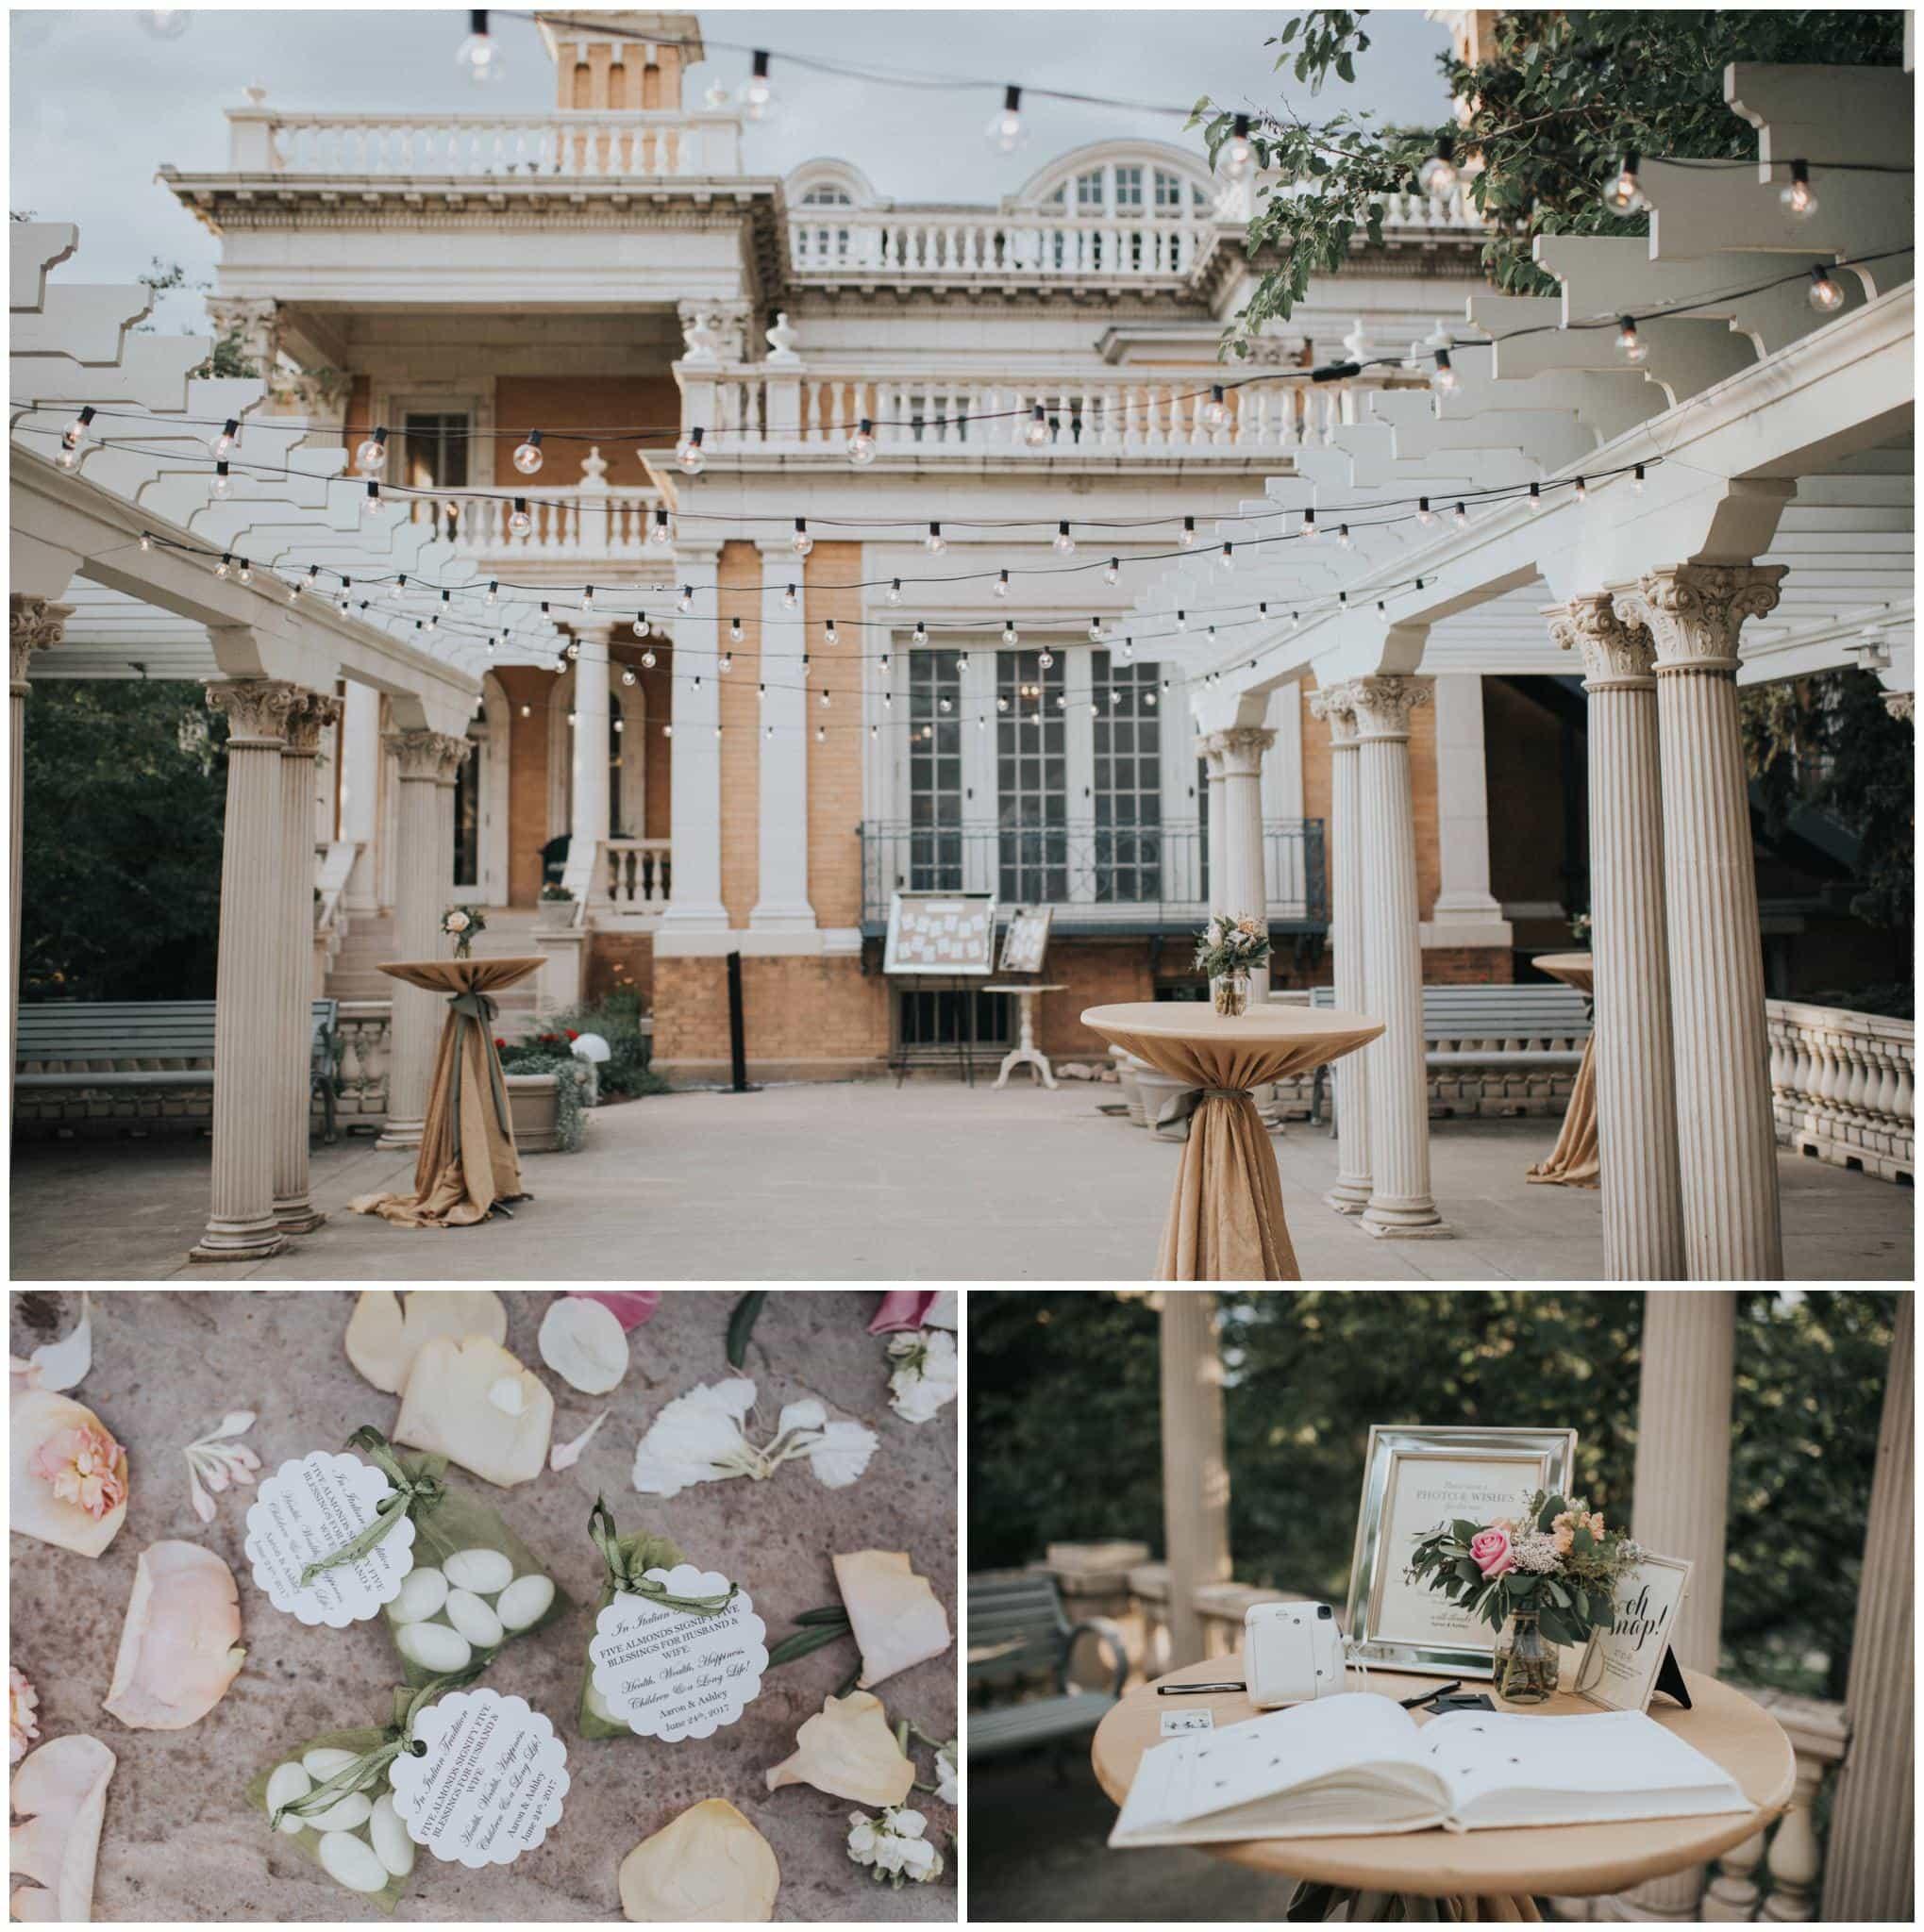 Grant-Humphreys Mansion Tableau-- Jill Houser Photography